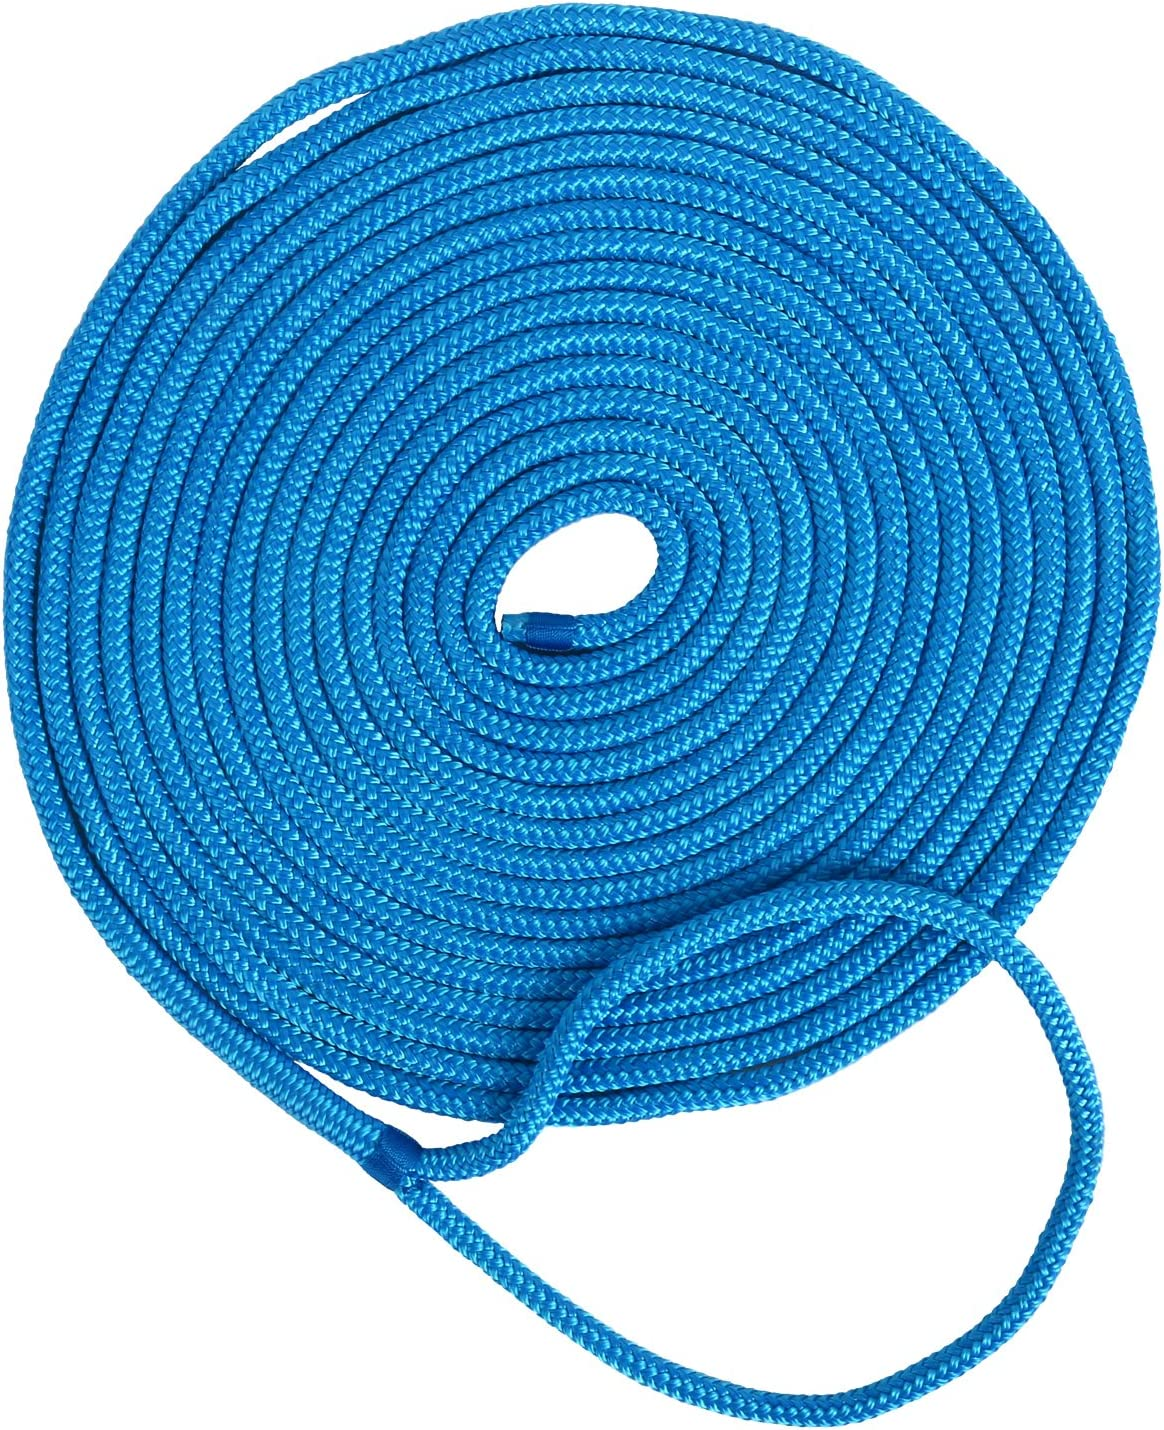 "Reflective Dock Line 1//2/"" 20/'Premium Double Braided Nylon Rope//Mooring Line Blue"